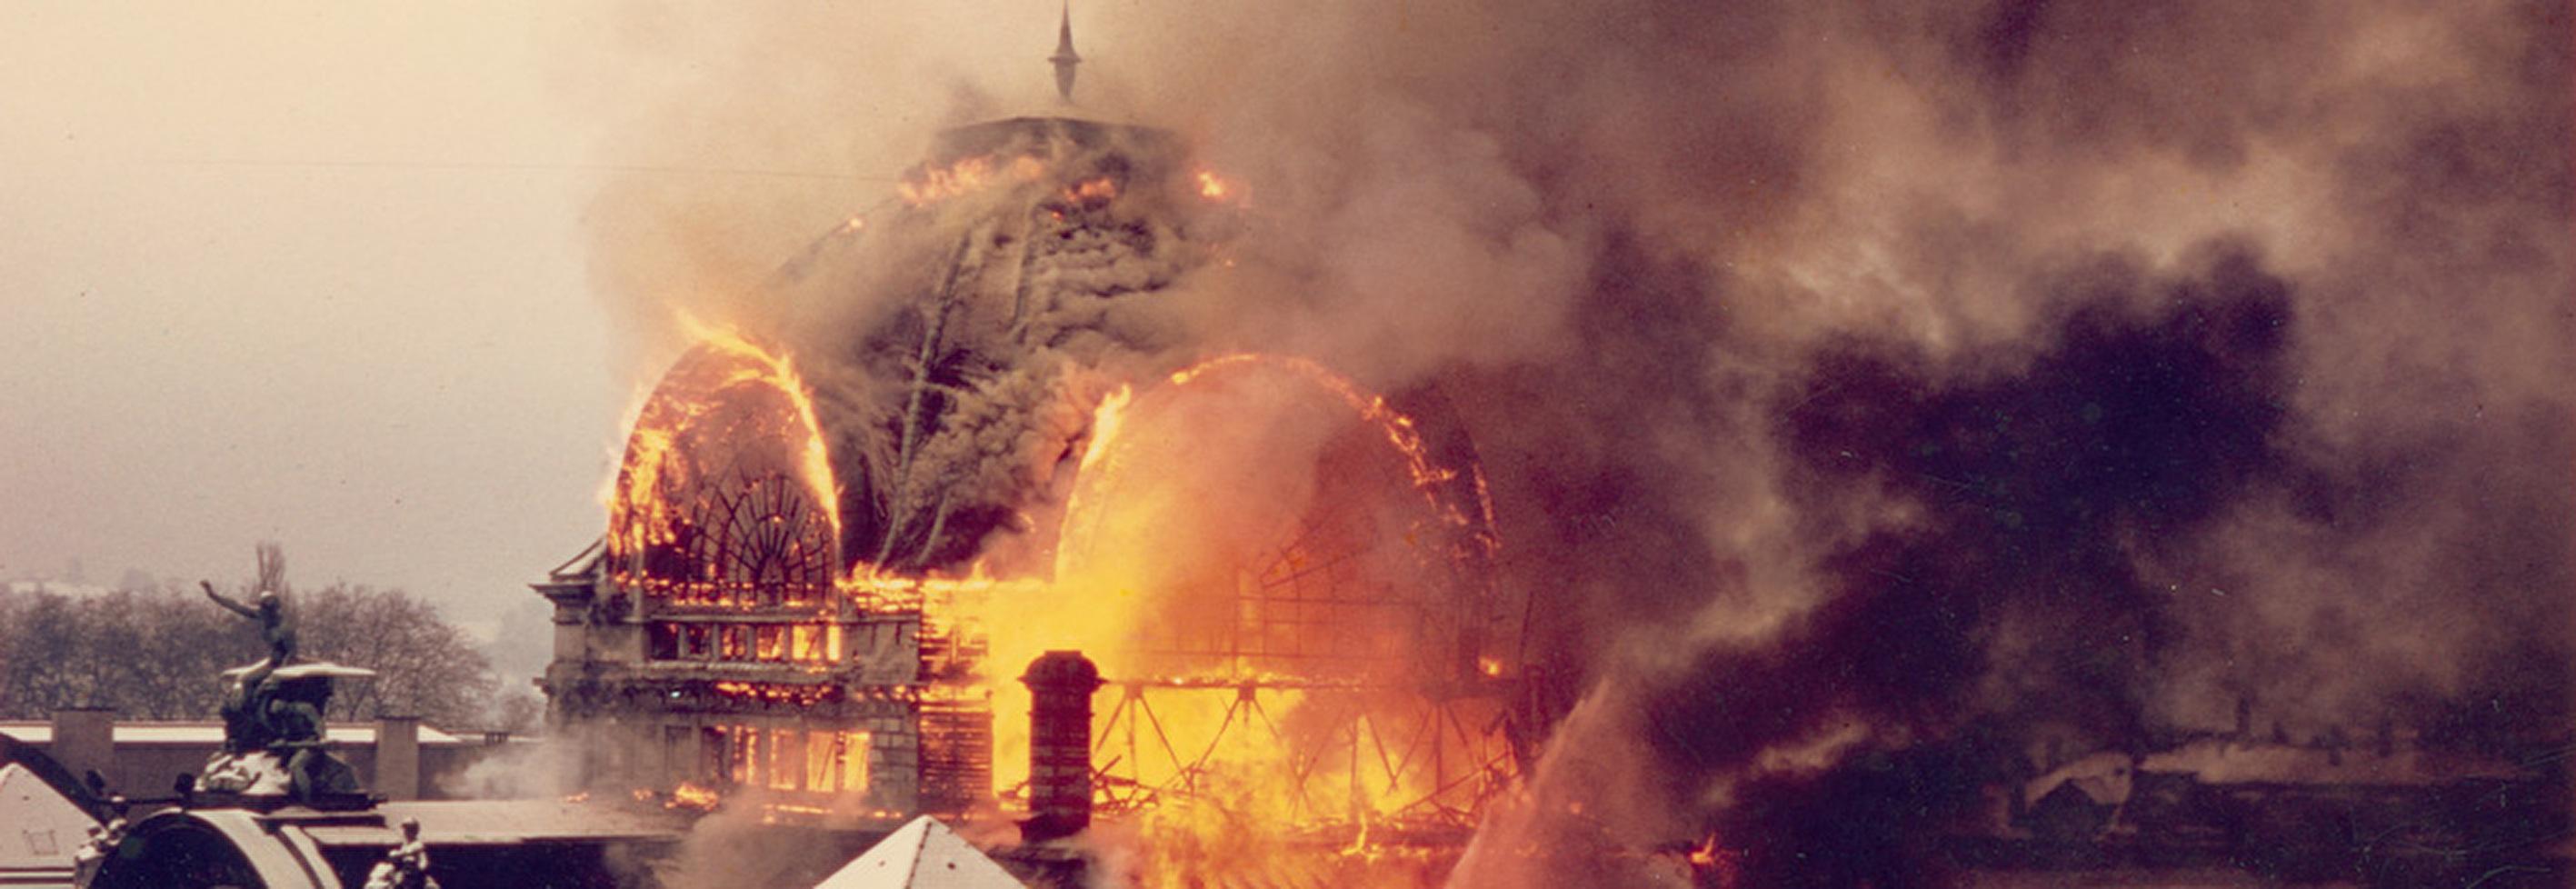 Bahnhofbrand Luzern 1971